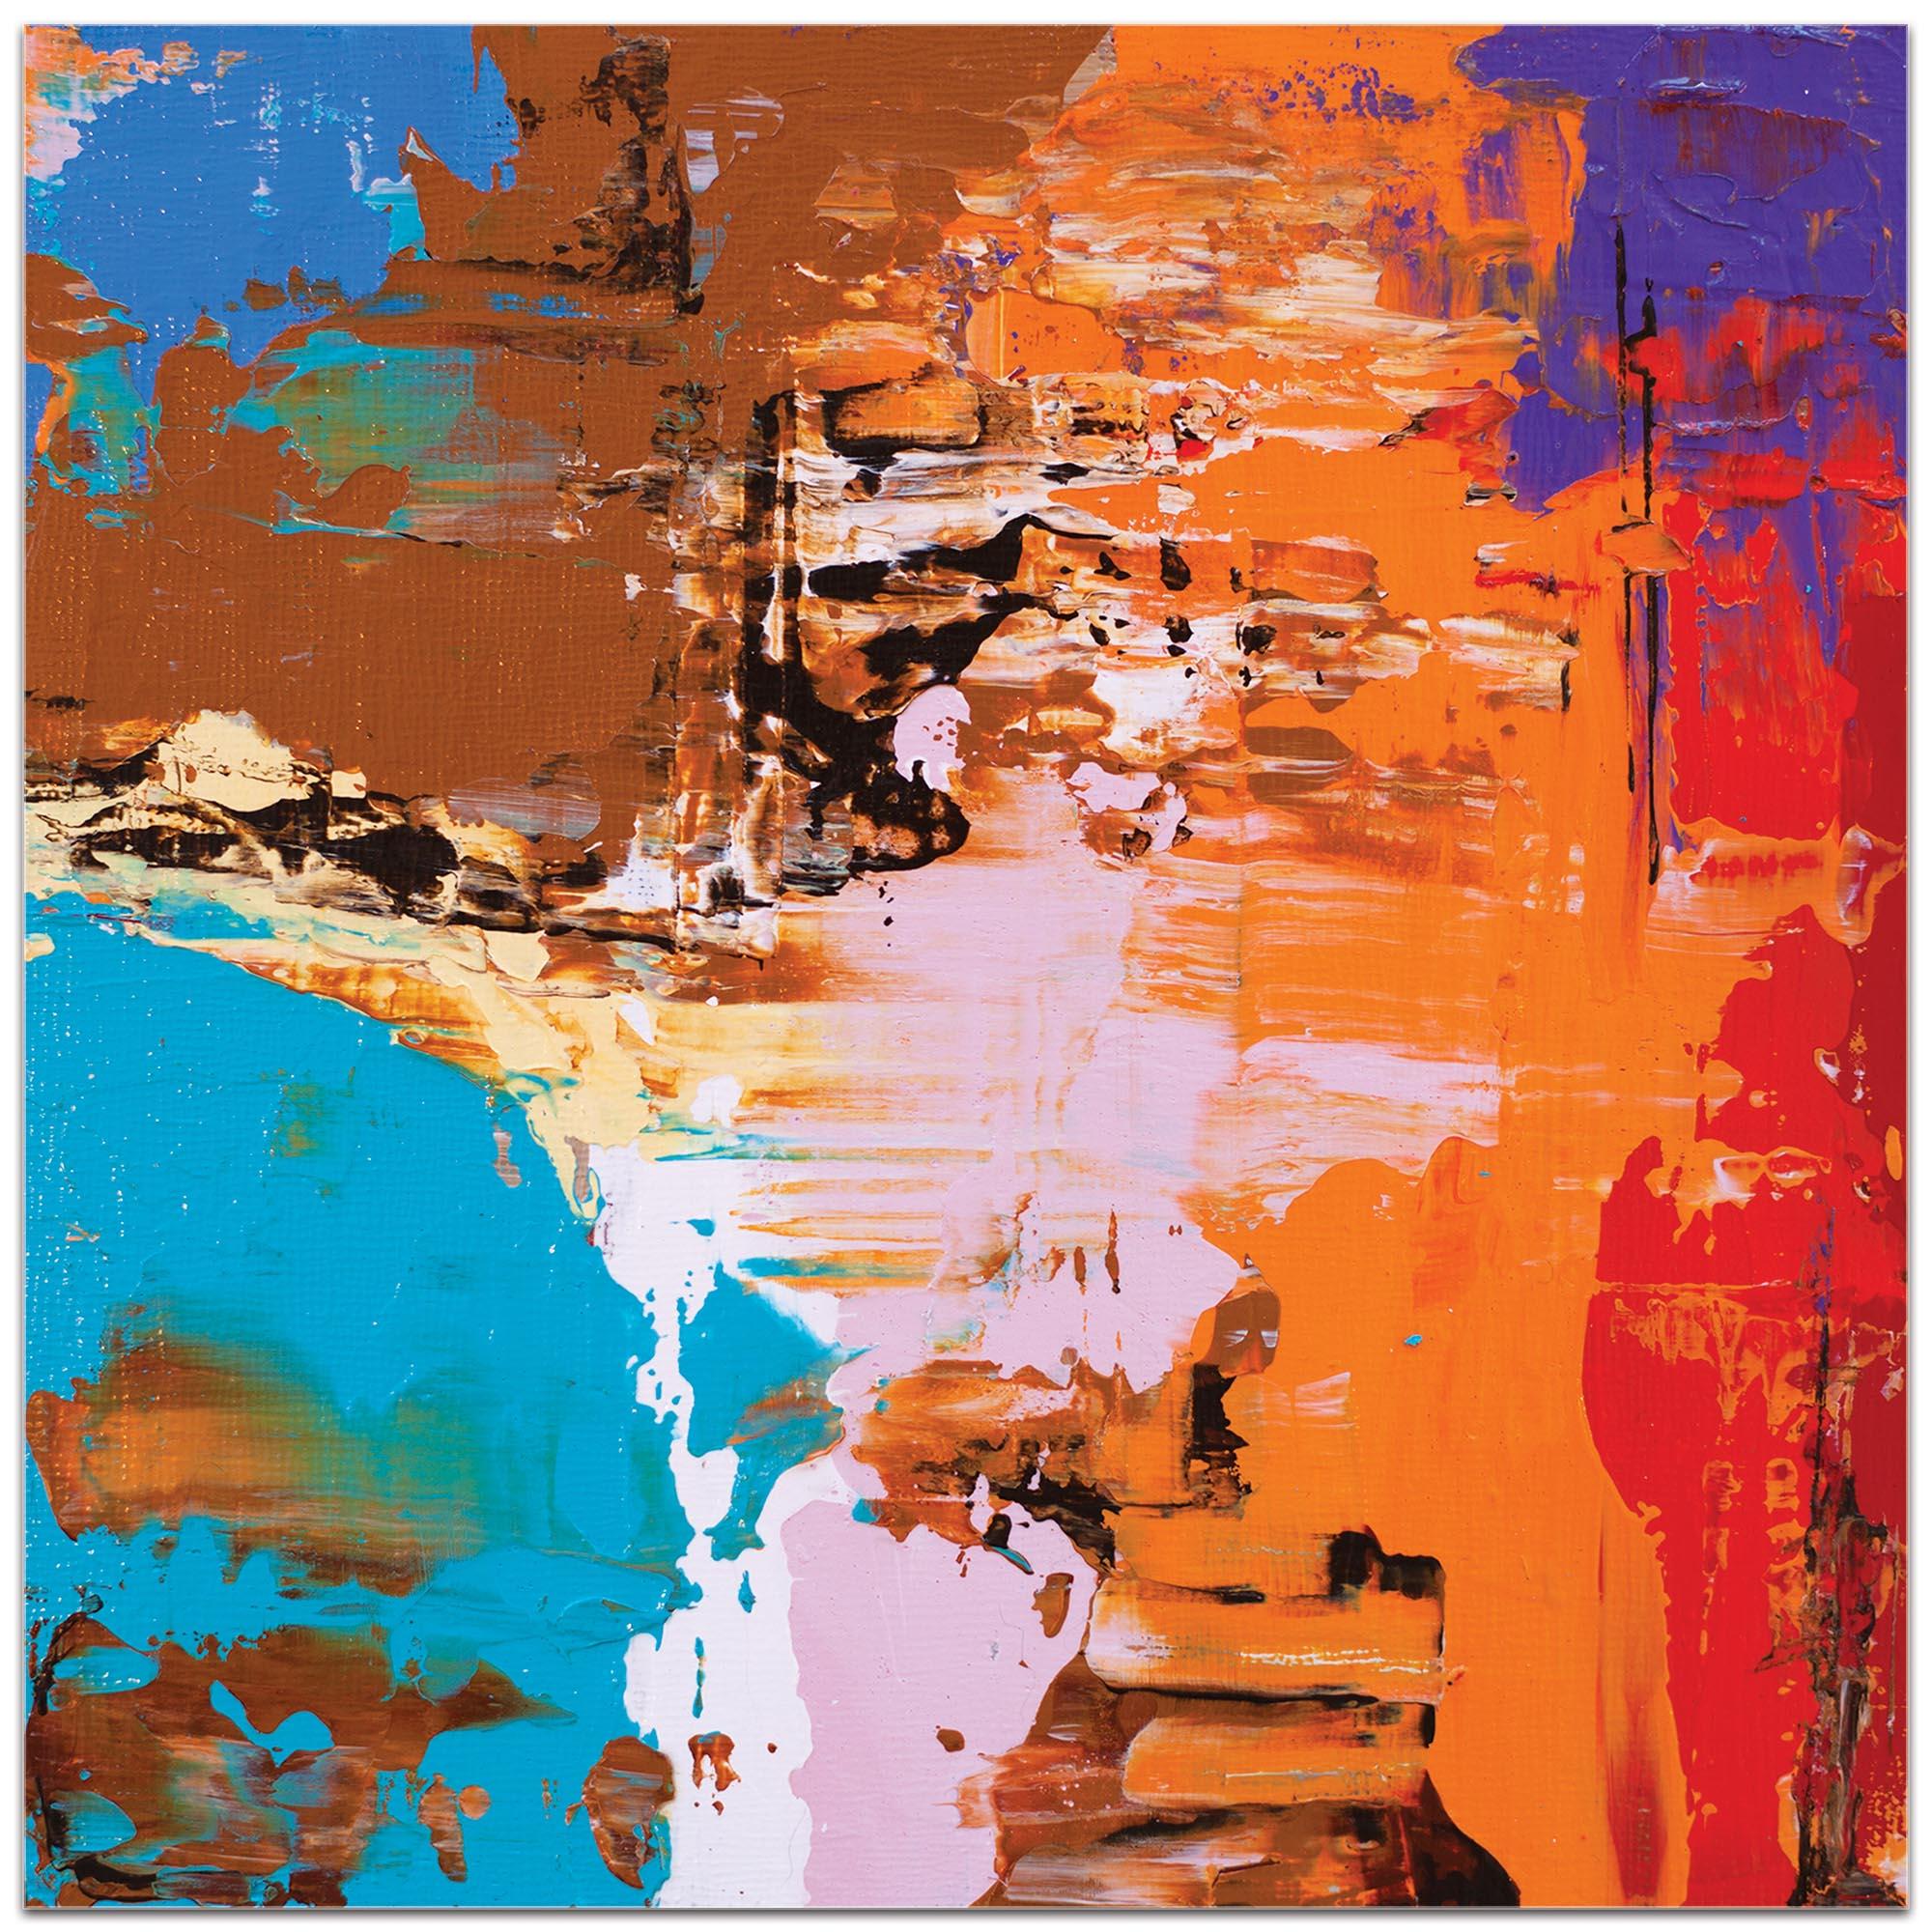 Abstract Wall Art 'Urban Life 14' - Urban Decor on Metal or Plexiglass - Image 2